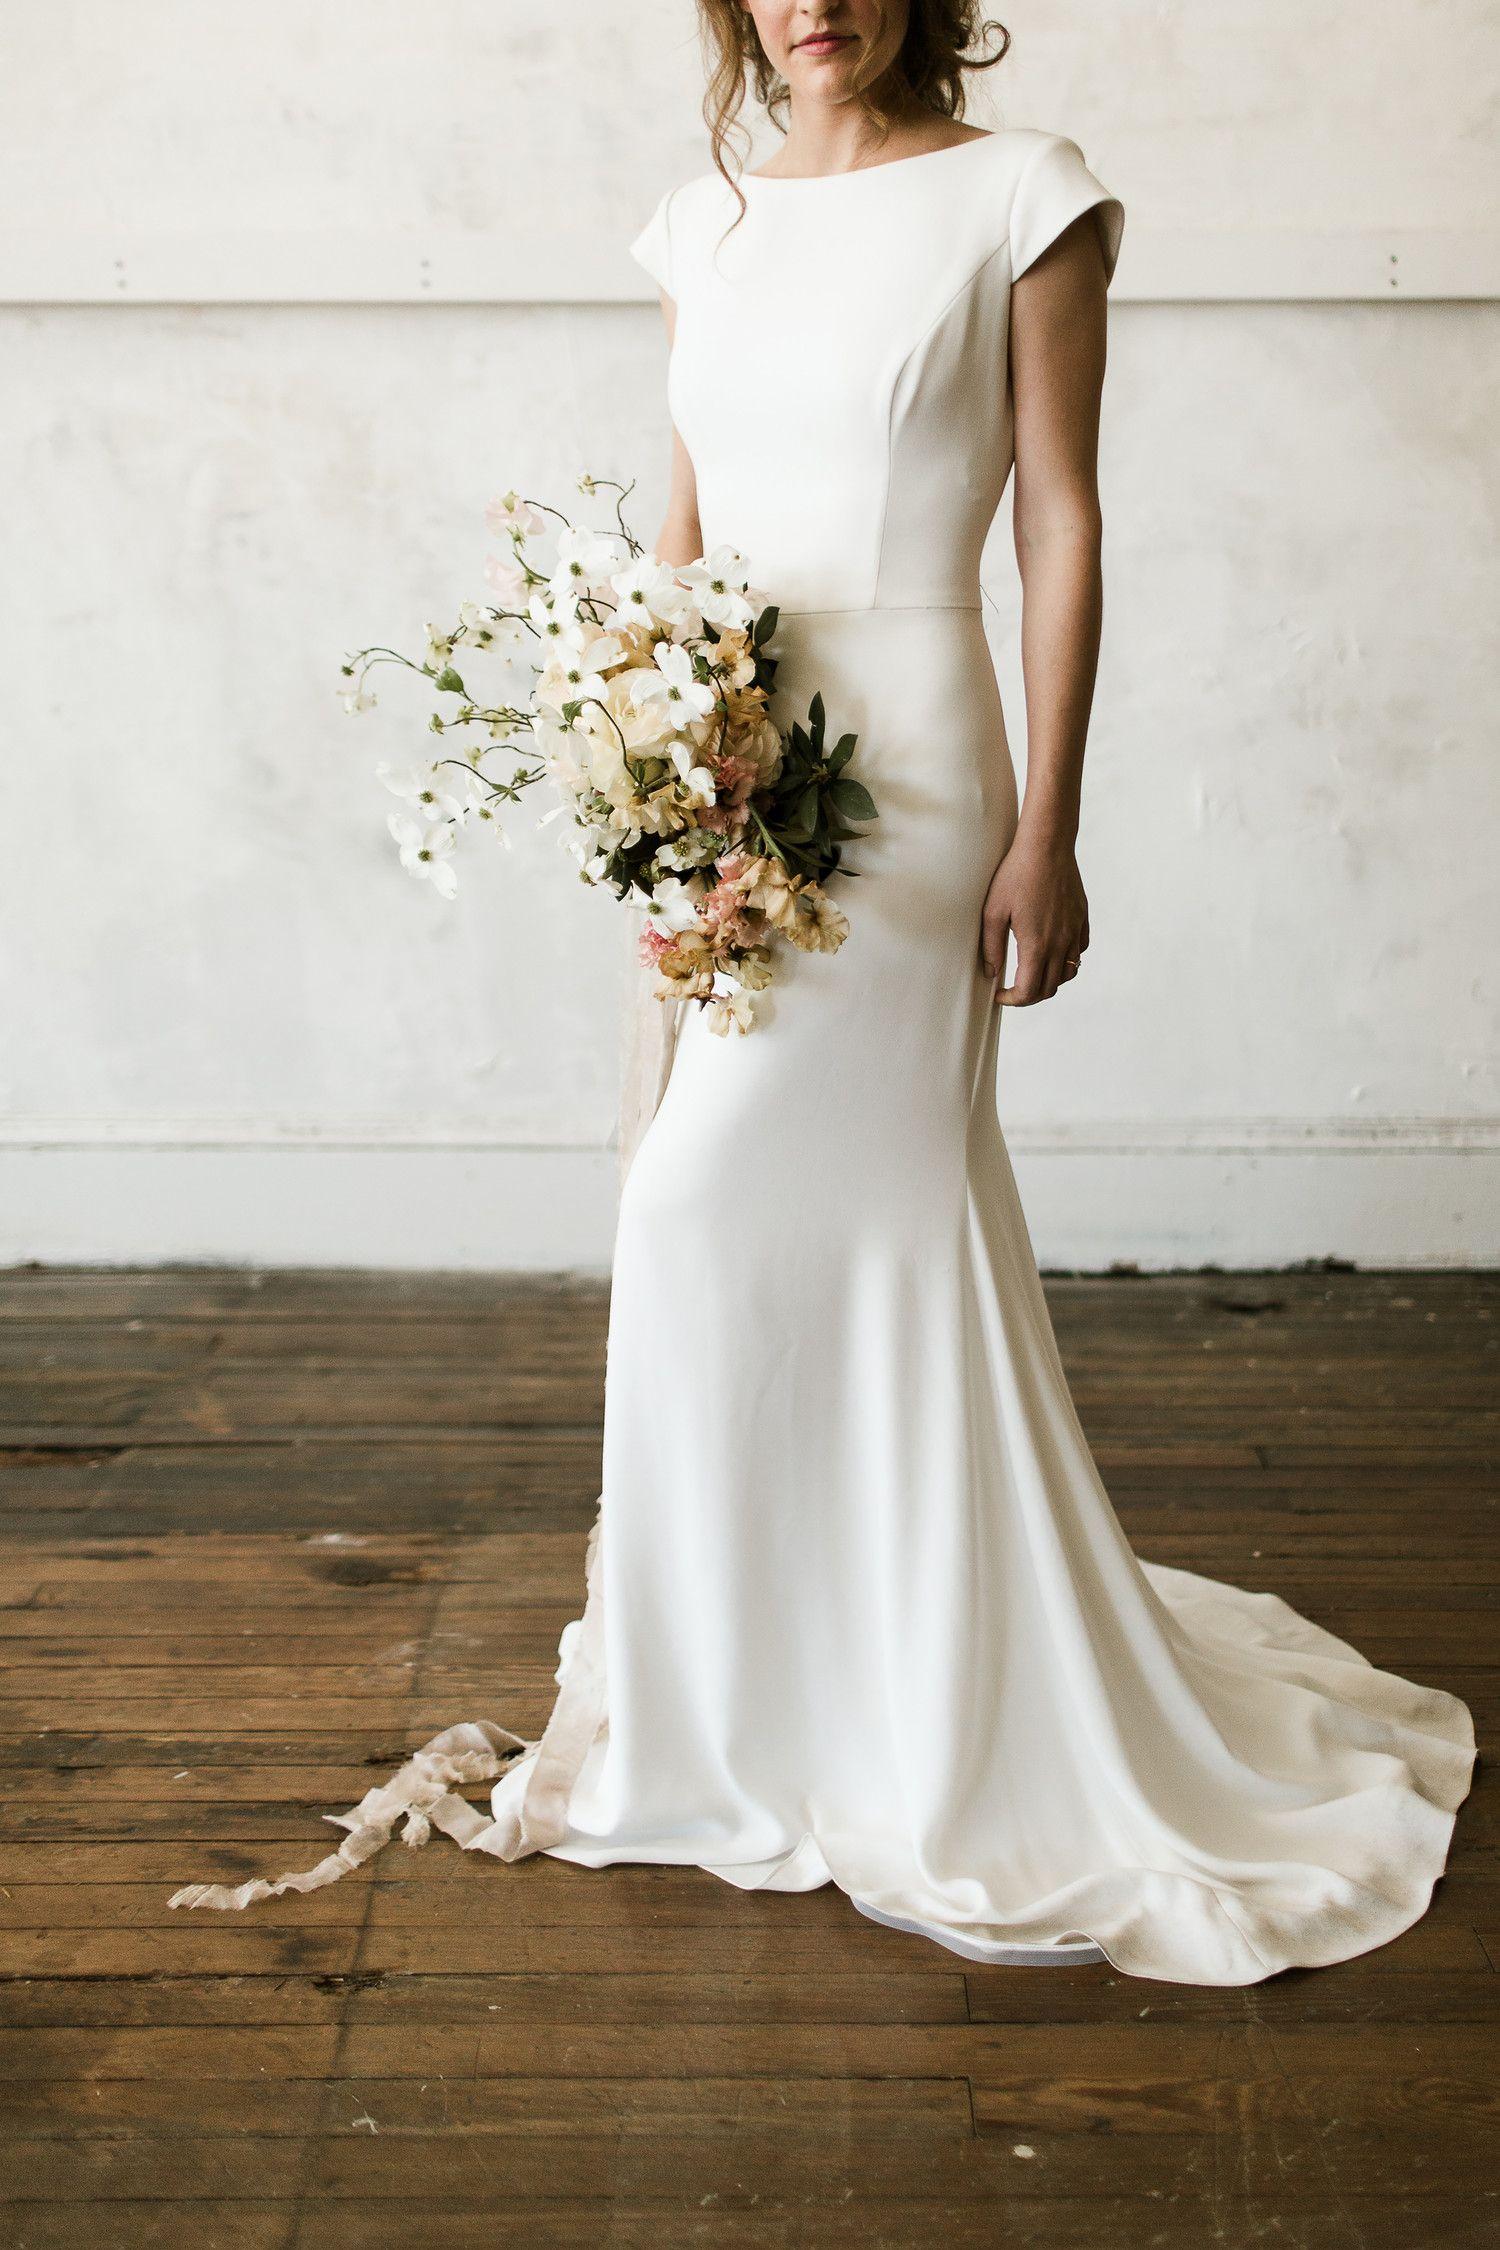 A Floral Trend We Re Loving Dogwood Wedding Bouquets Minimalist